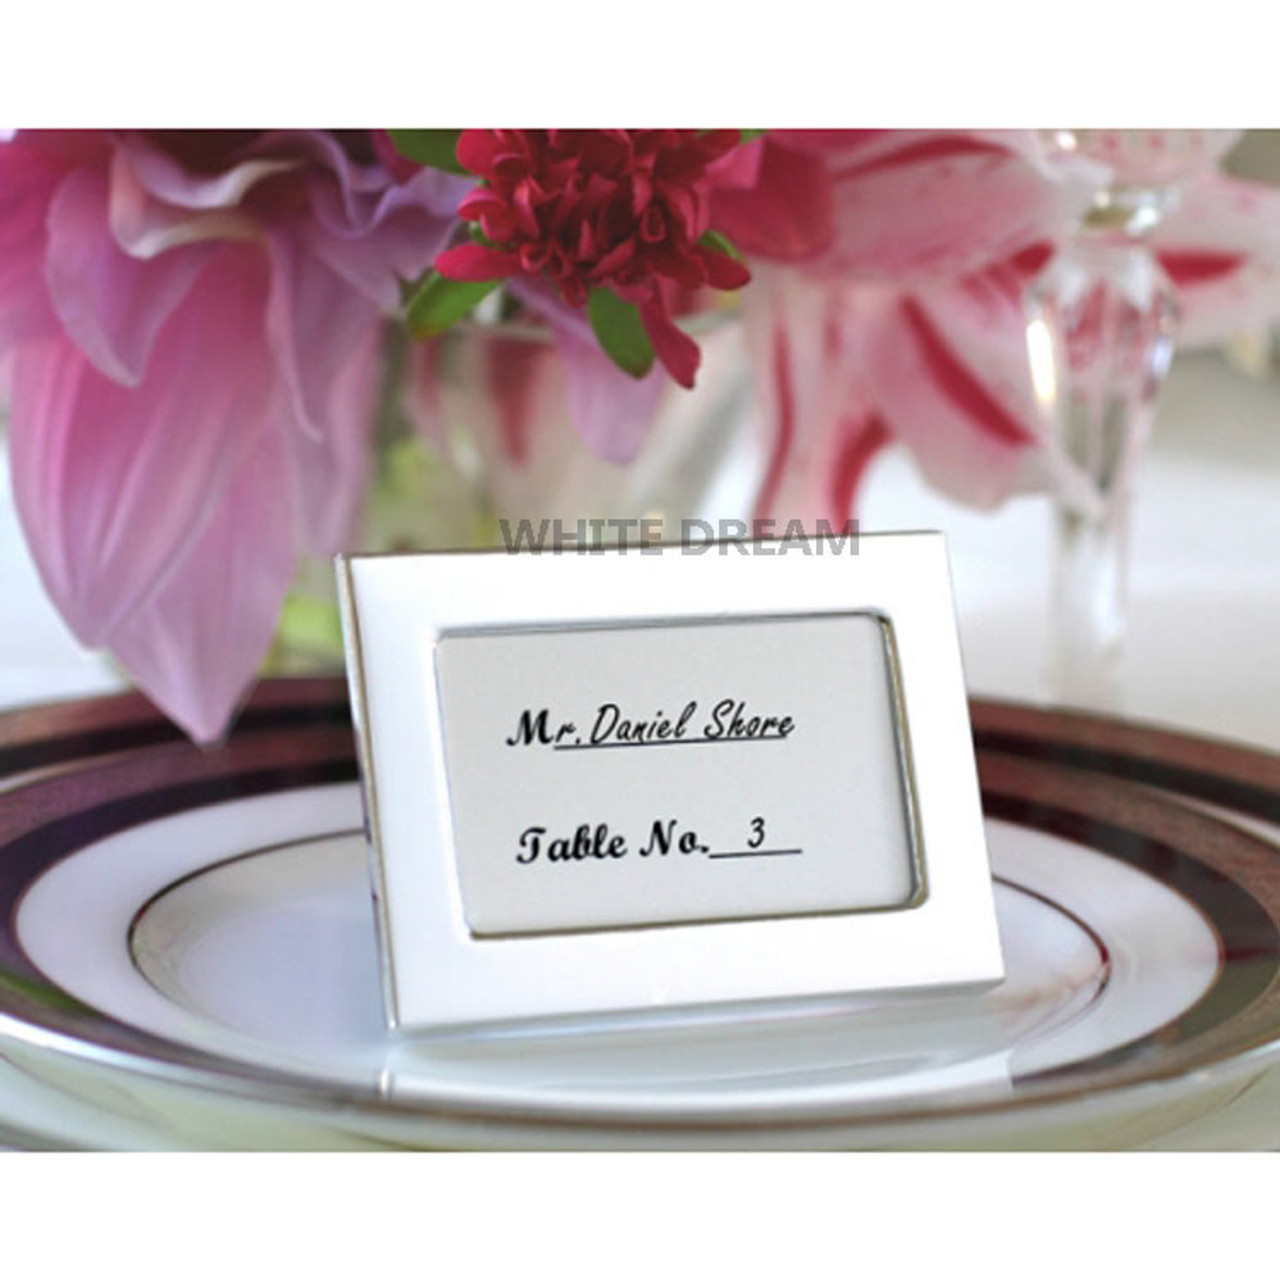 Silver Photo Frames Wedding Favour Place Card Miniature